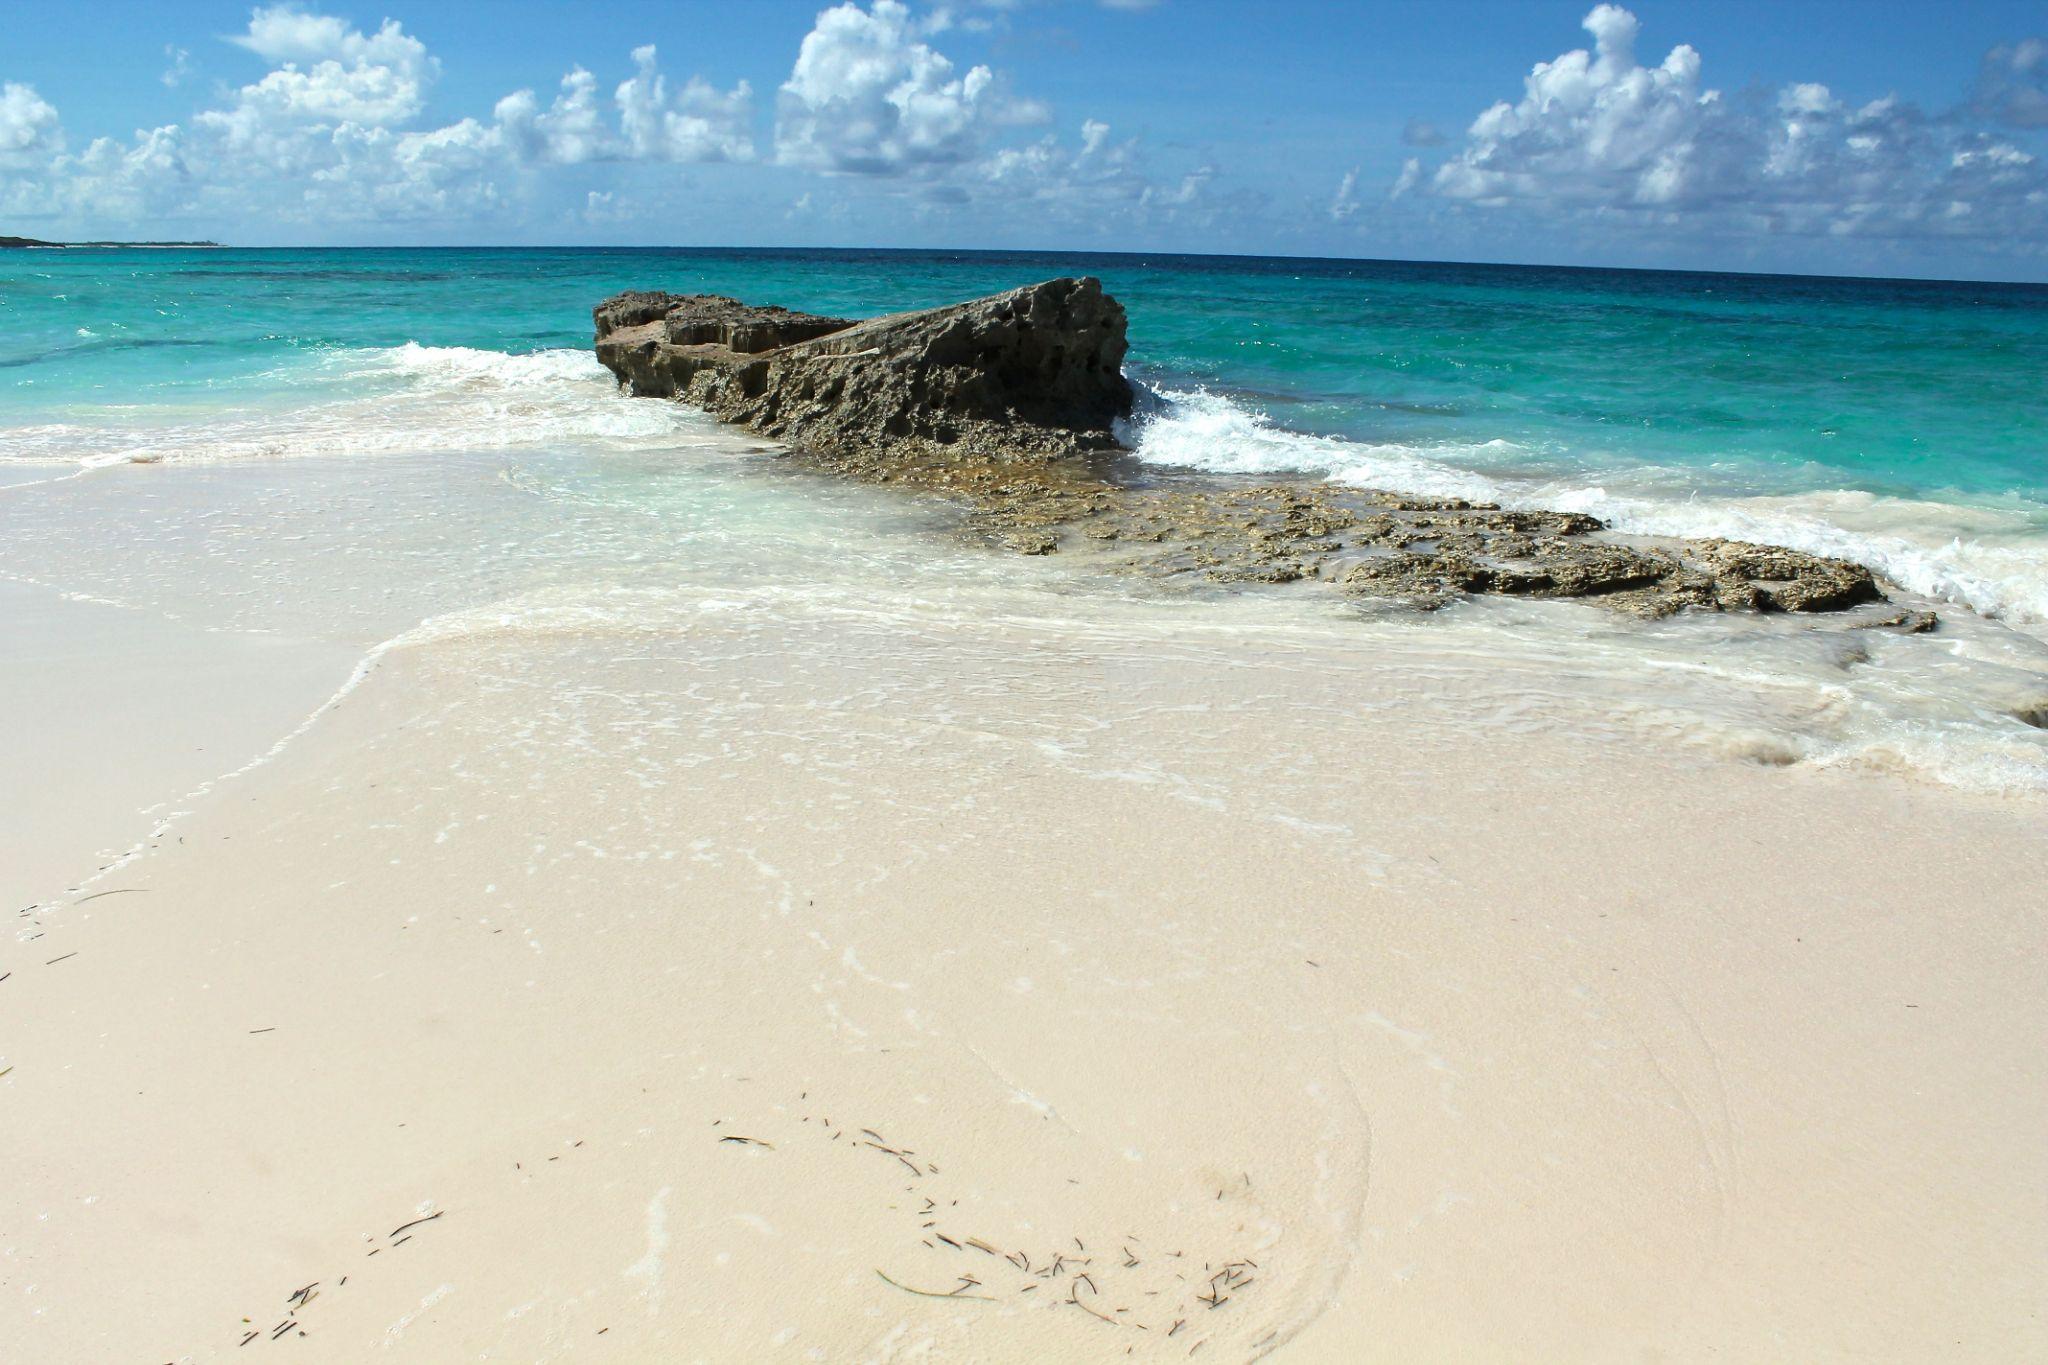 Sea and Sand, Bahamas by Sandra Dubout